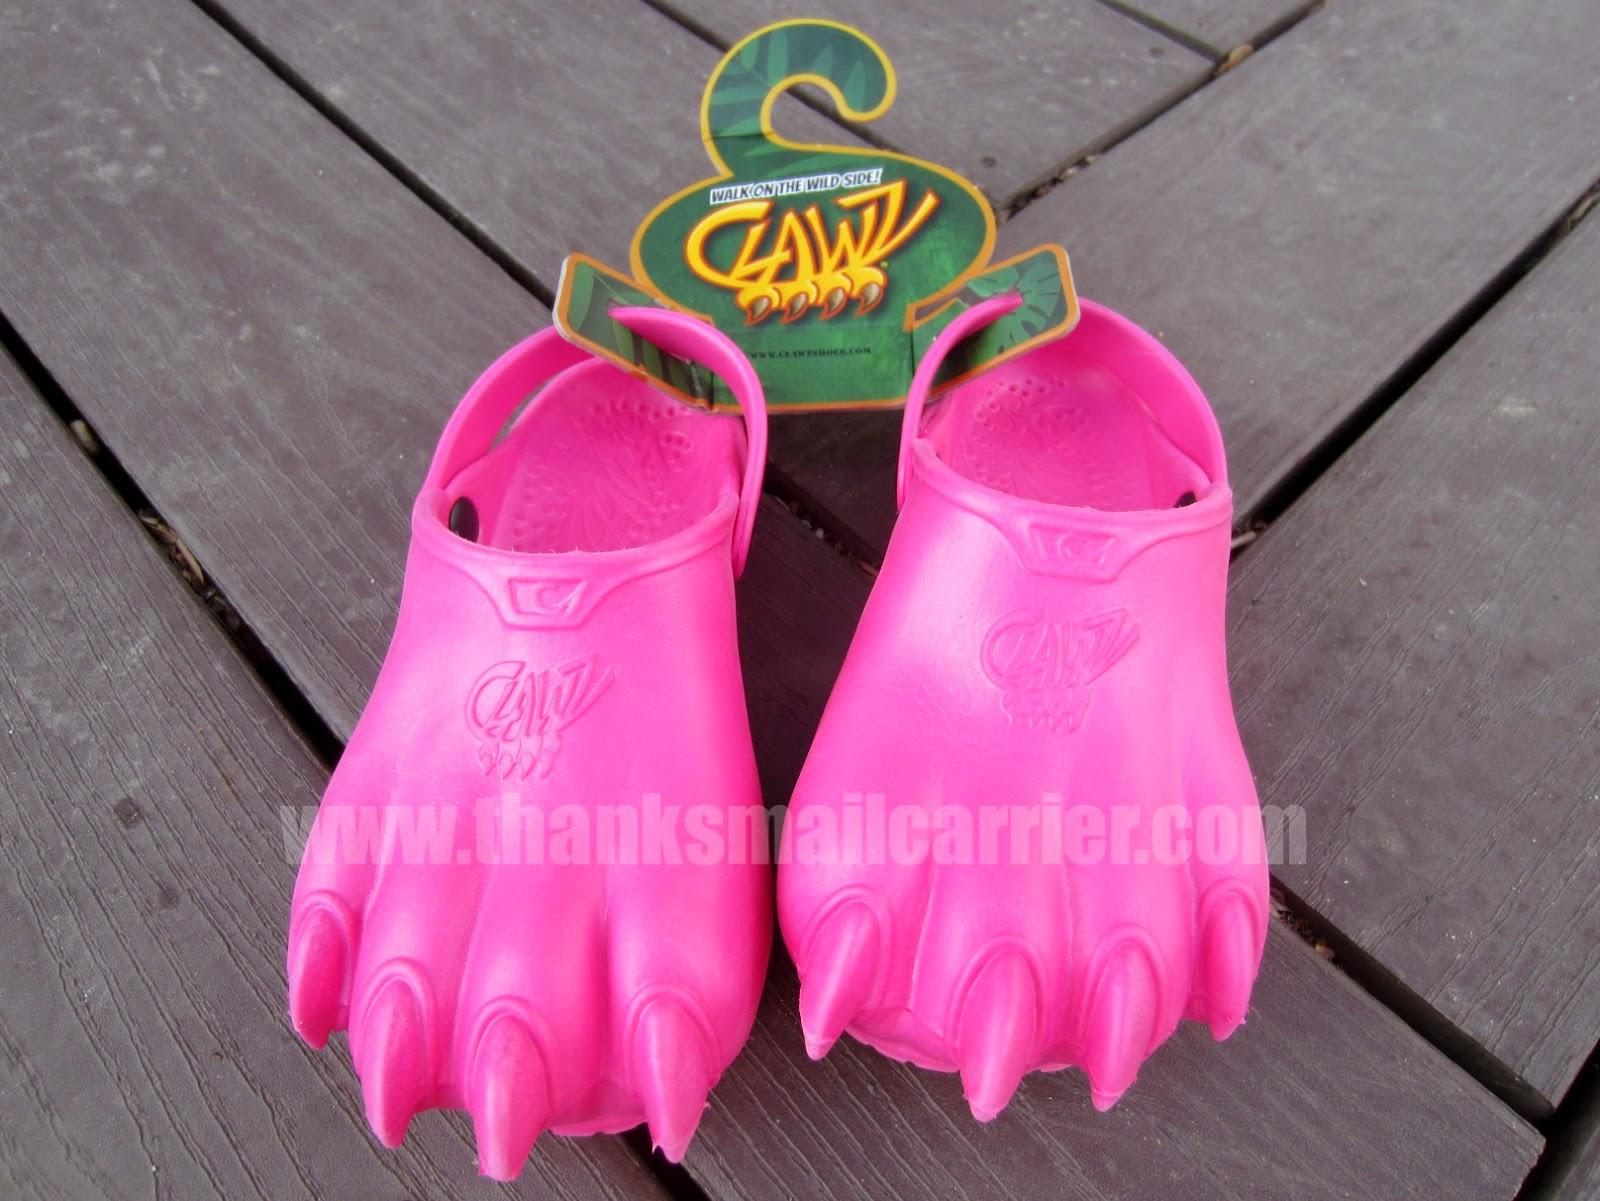 Clawz shoes